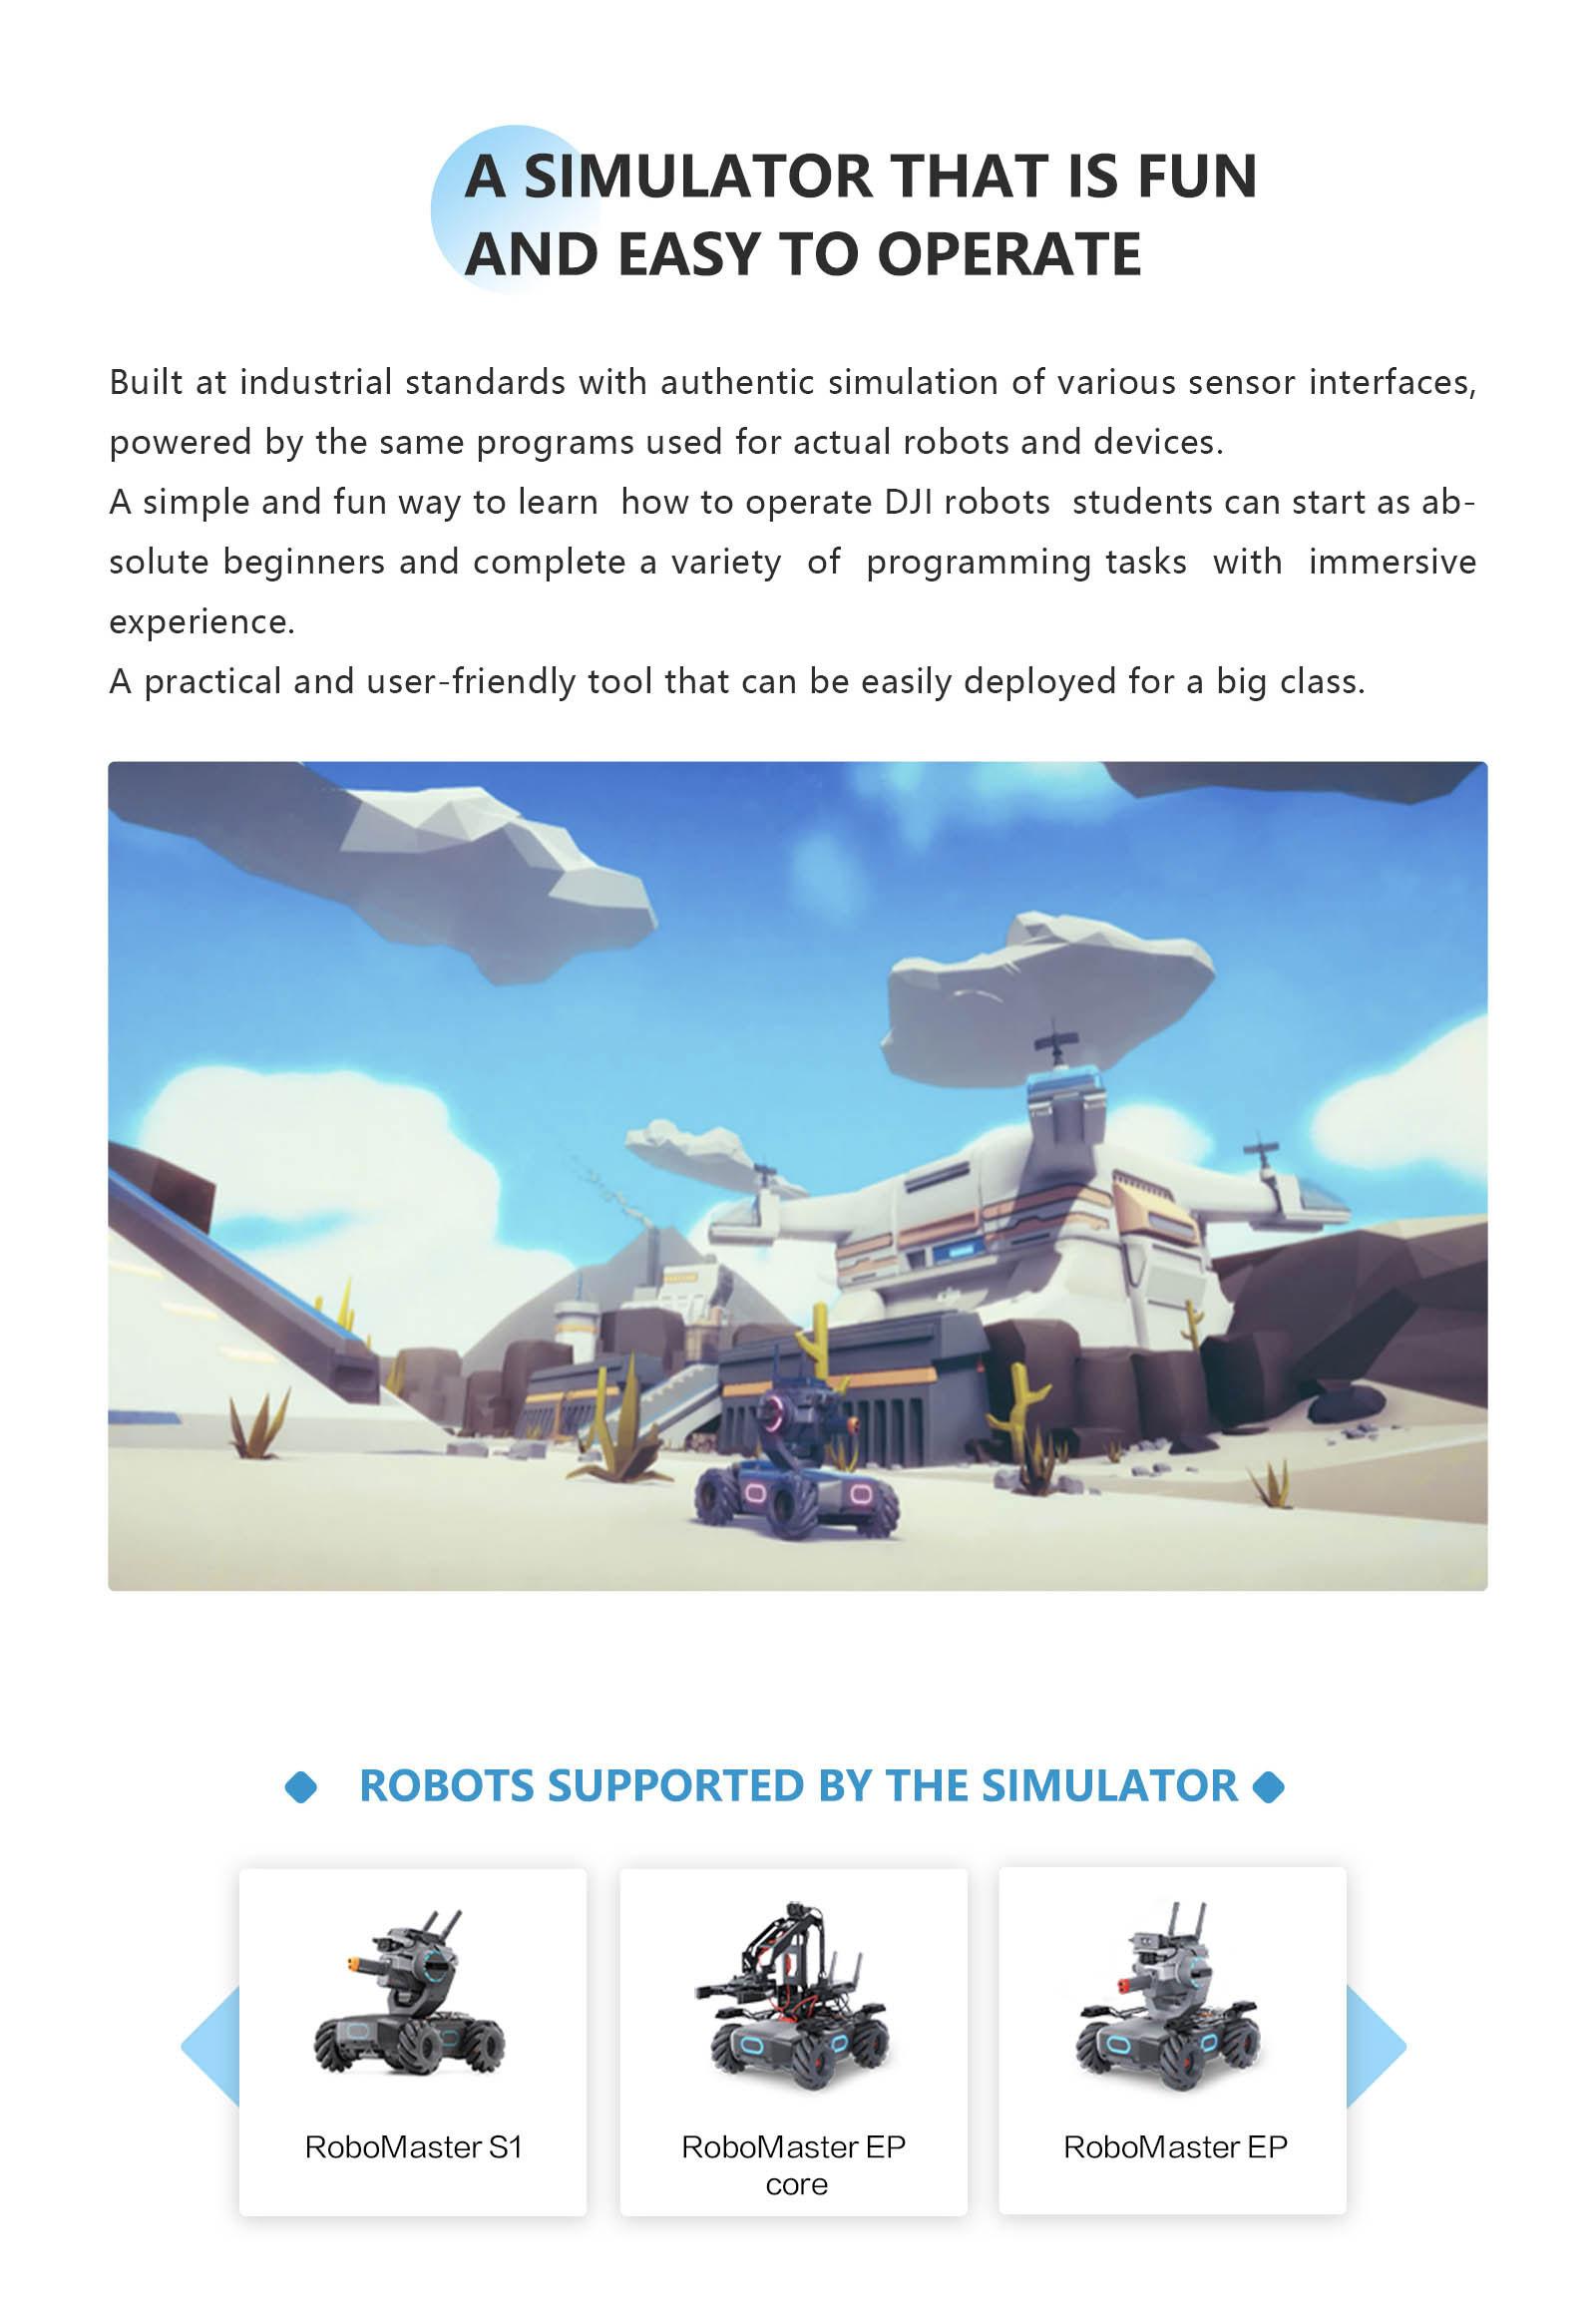 DJI Education Hub - Robots Supported